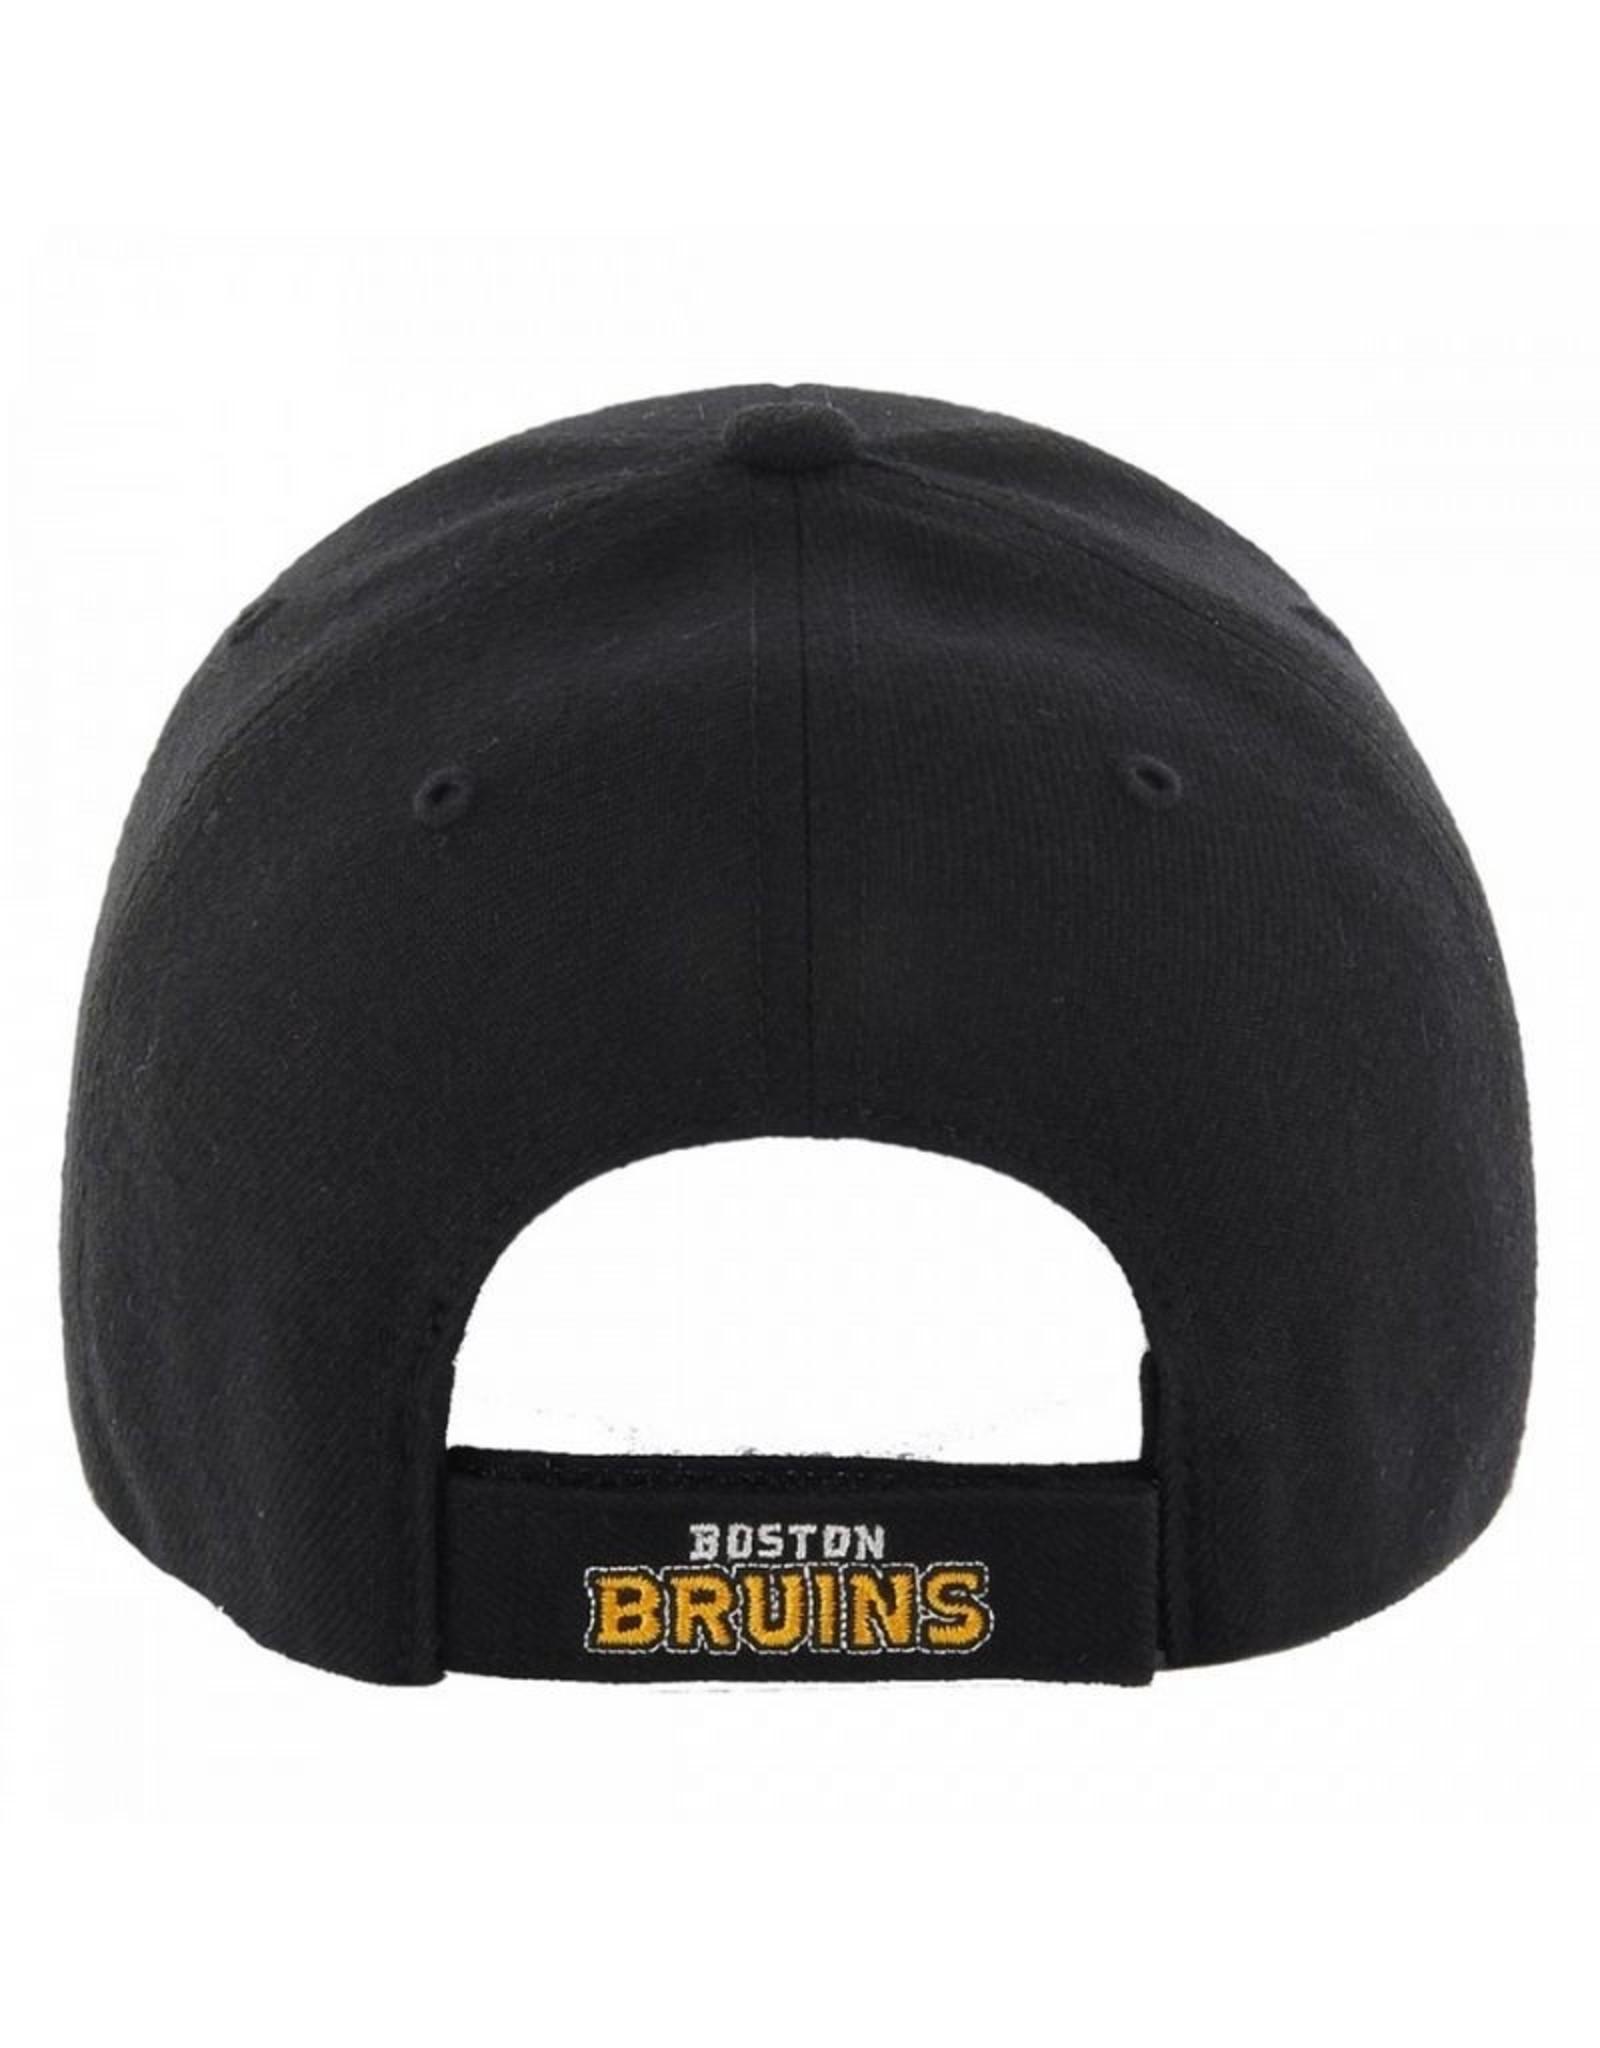 '47 MVP Men's Hat Primary Logo Boston Bruins Black Adjustable